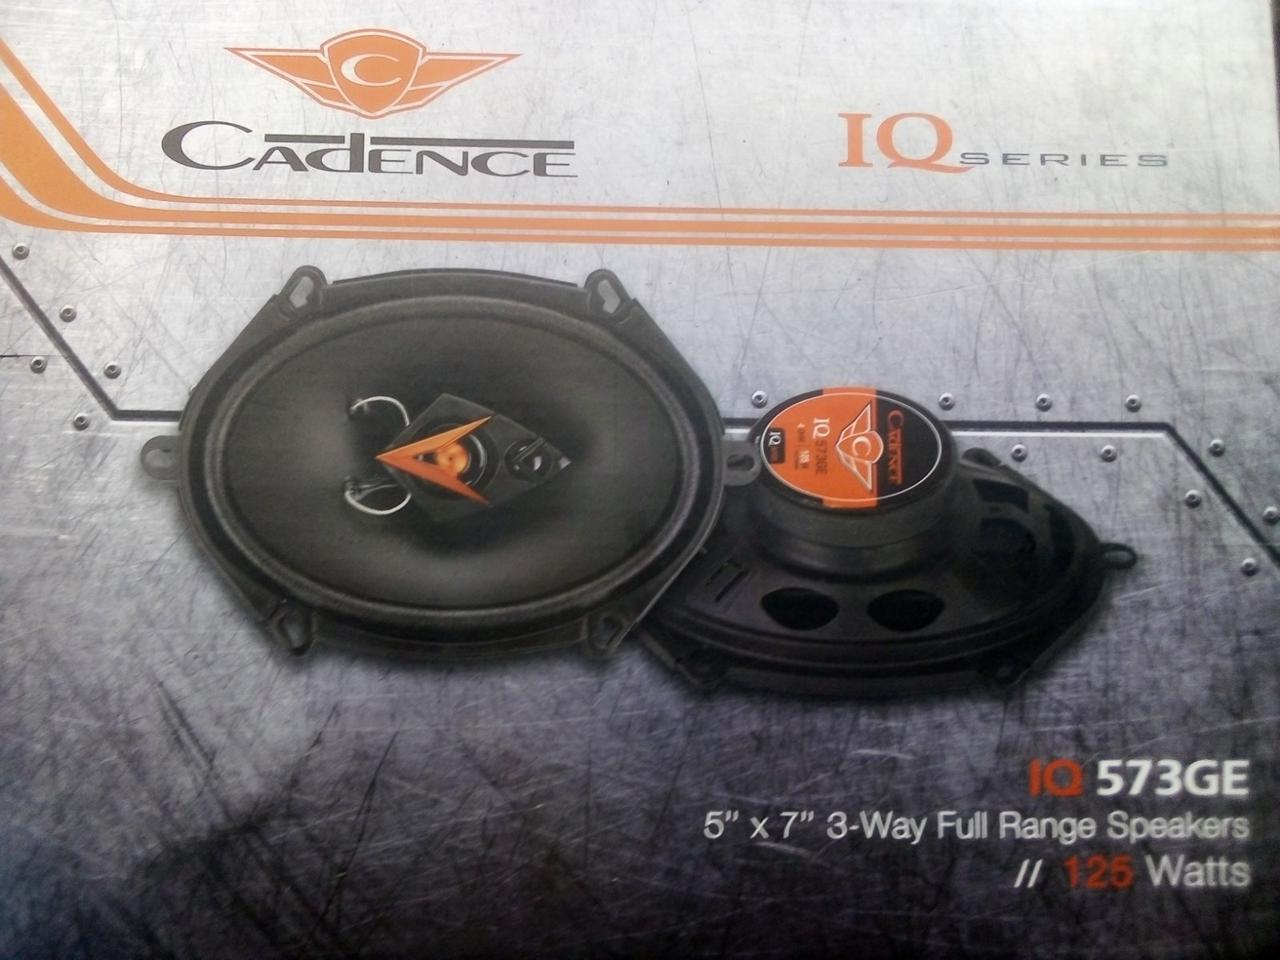 Акустика Cadence IQ 573GE